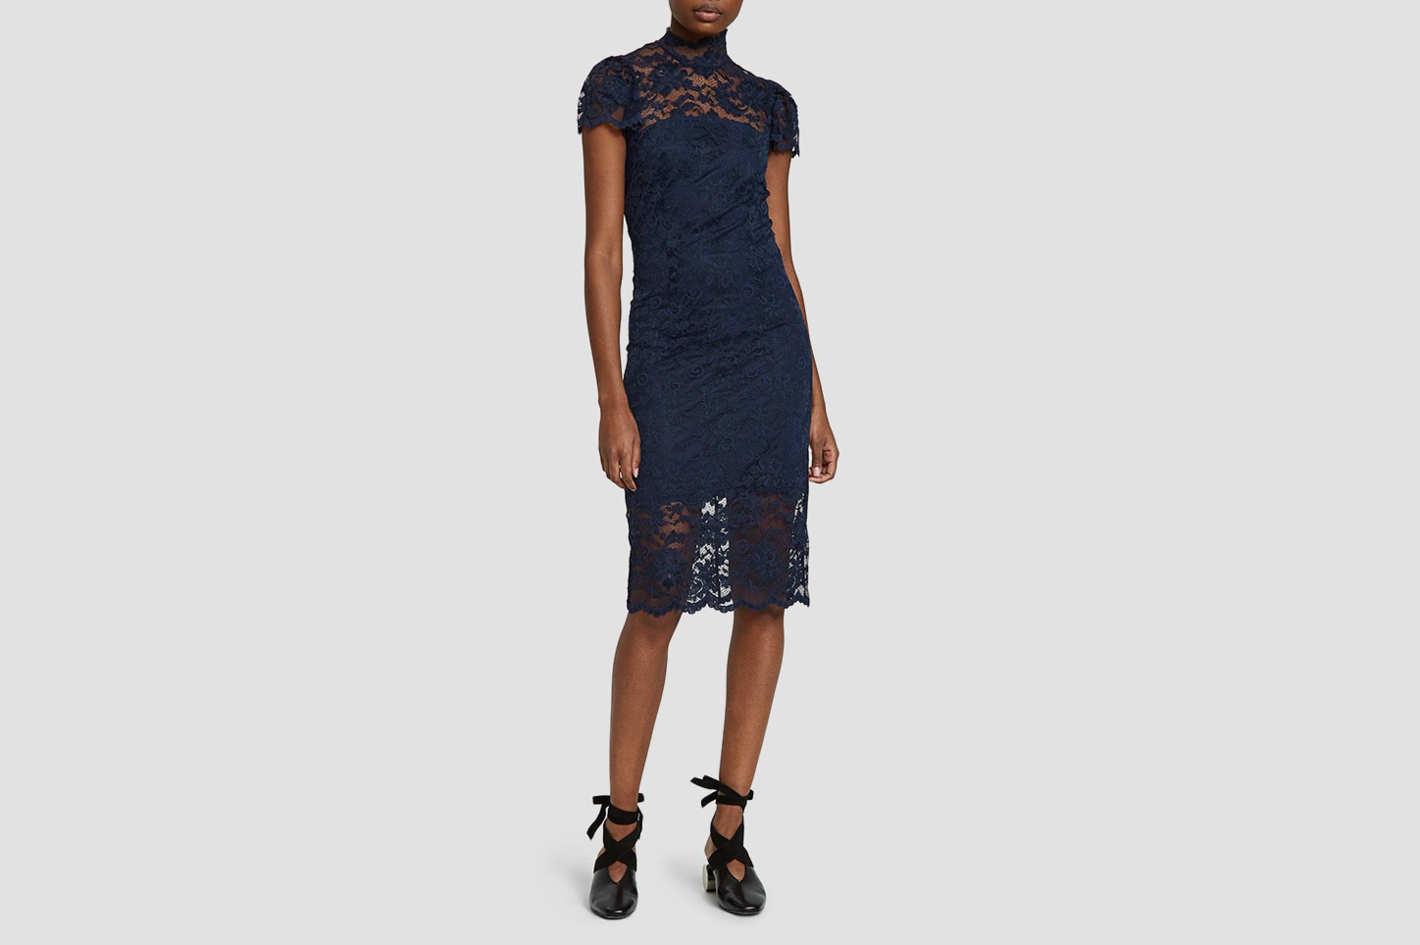 Ganni Flynn Lace Dress in Total Eclipse